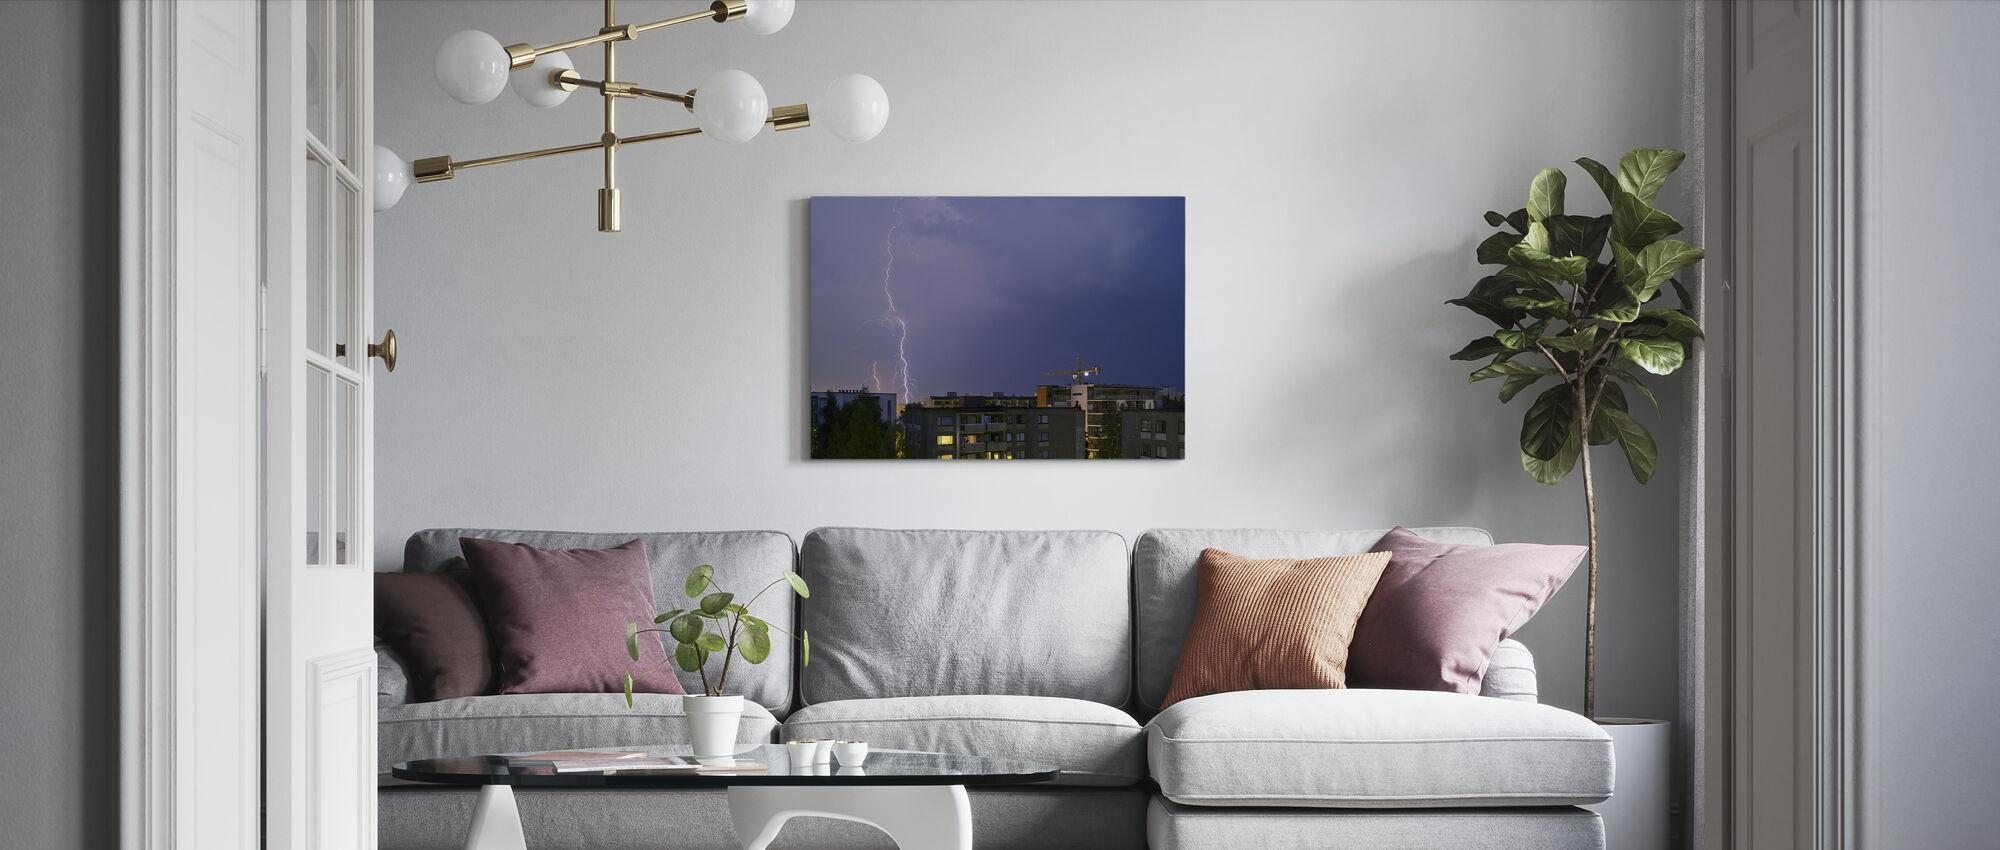 Flash among Apartments - Canvas print - Living Room